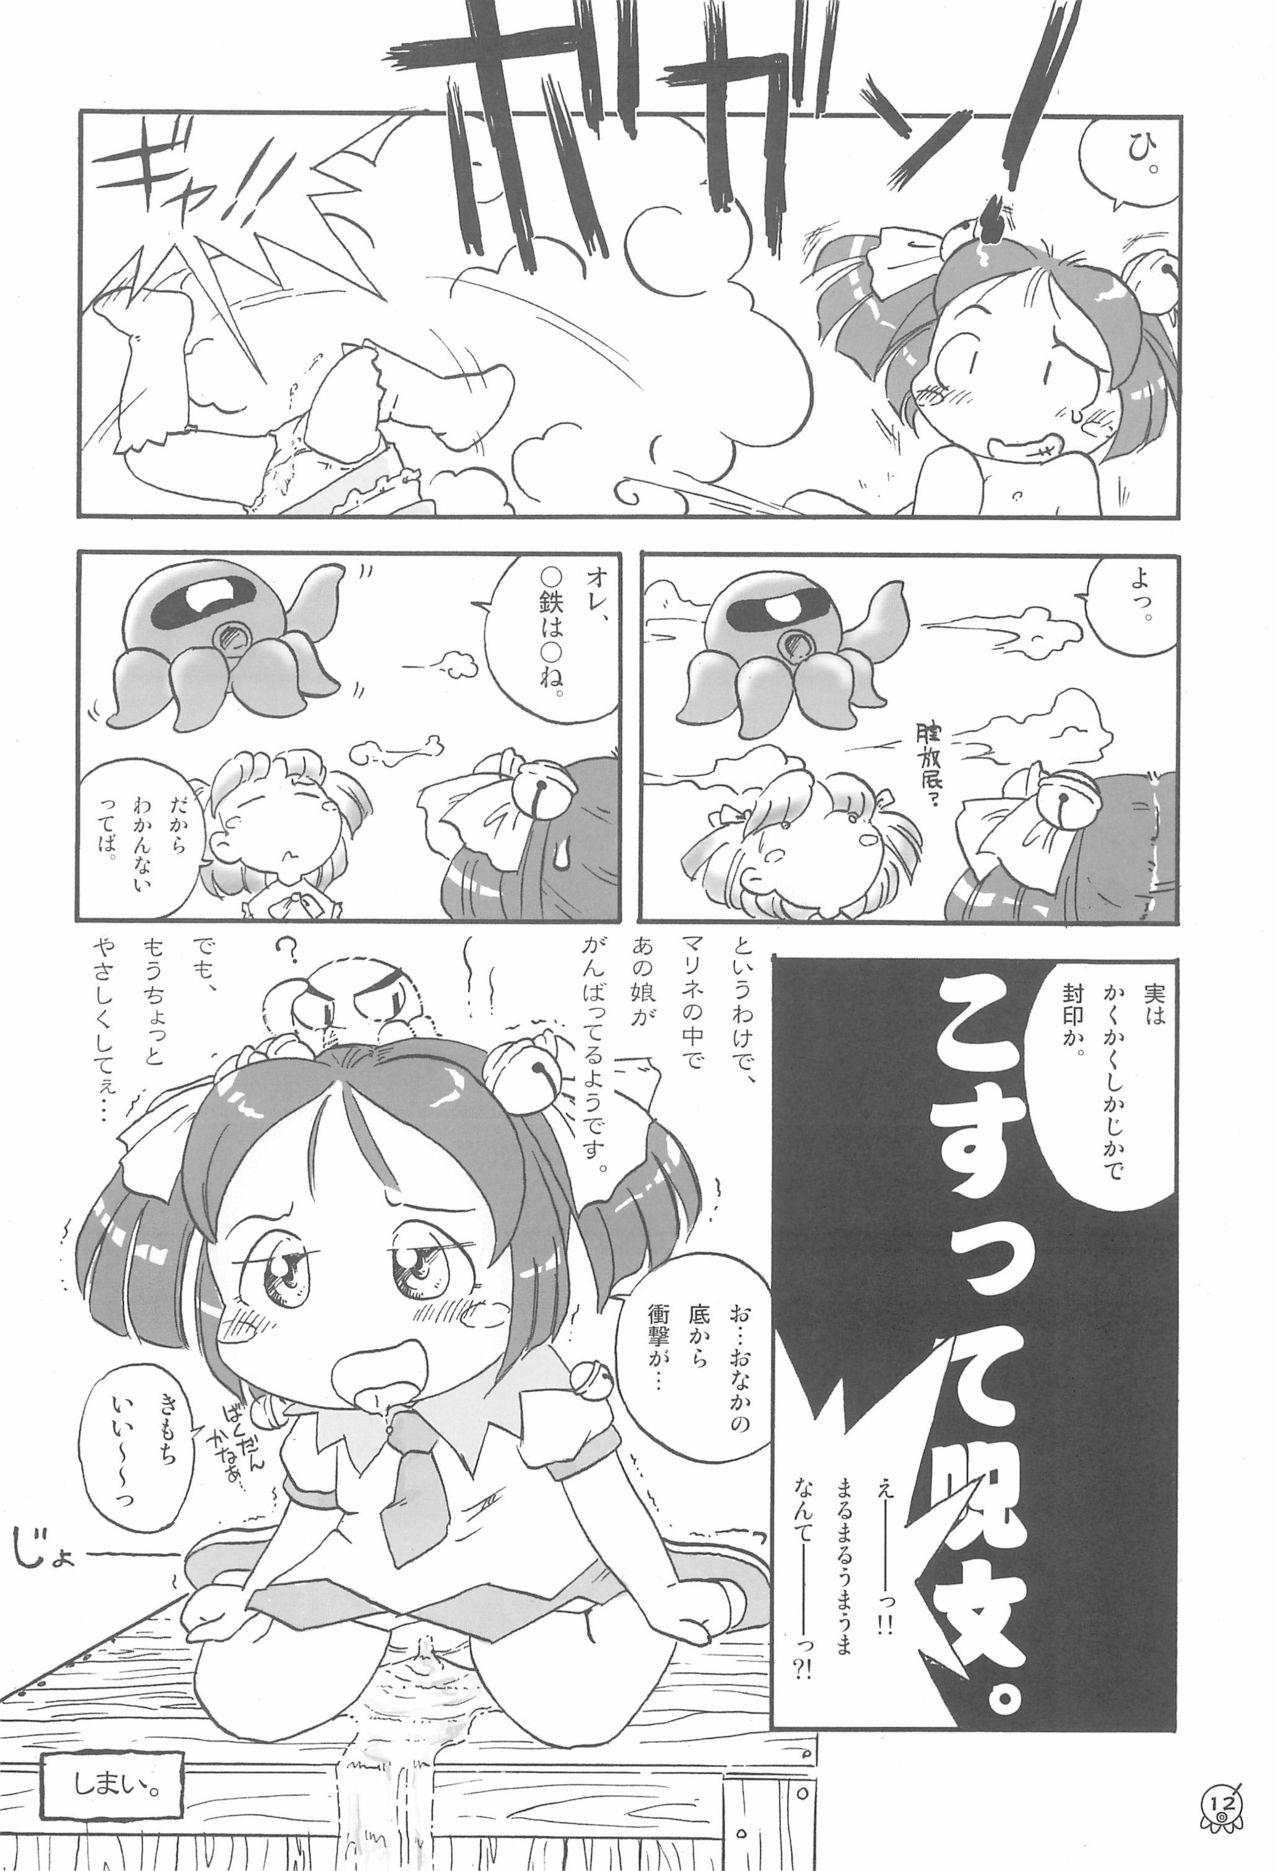 TakoMari BOOK 13